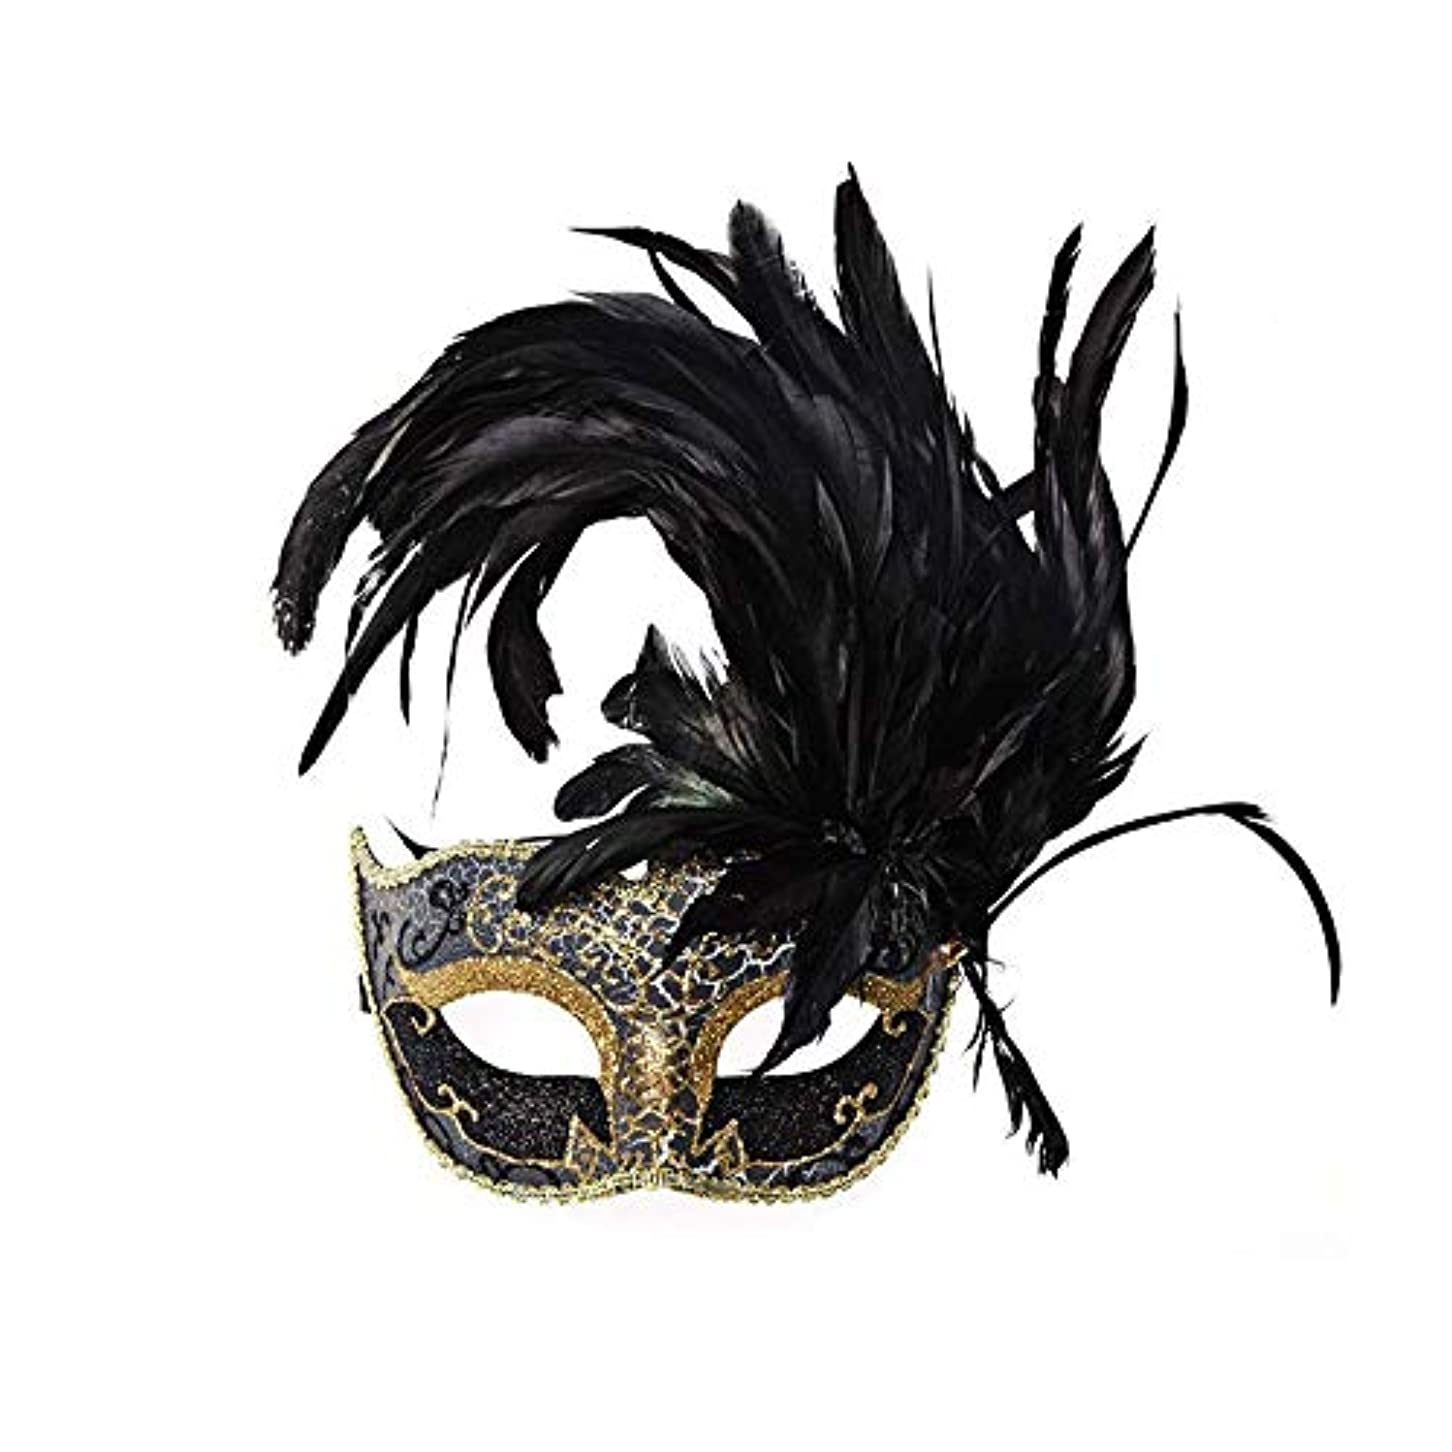 Nanle ハロウィンマスクハーフフェザーマスクベニスプリンセスマスク美容レース仮面ライダーコスプレ (色 : Style A black)